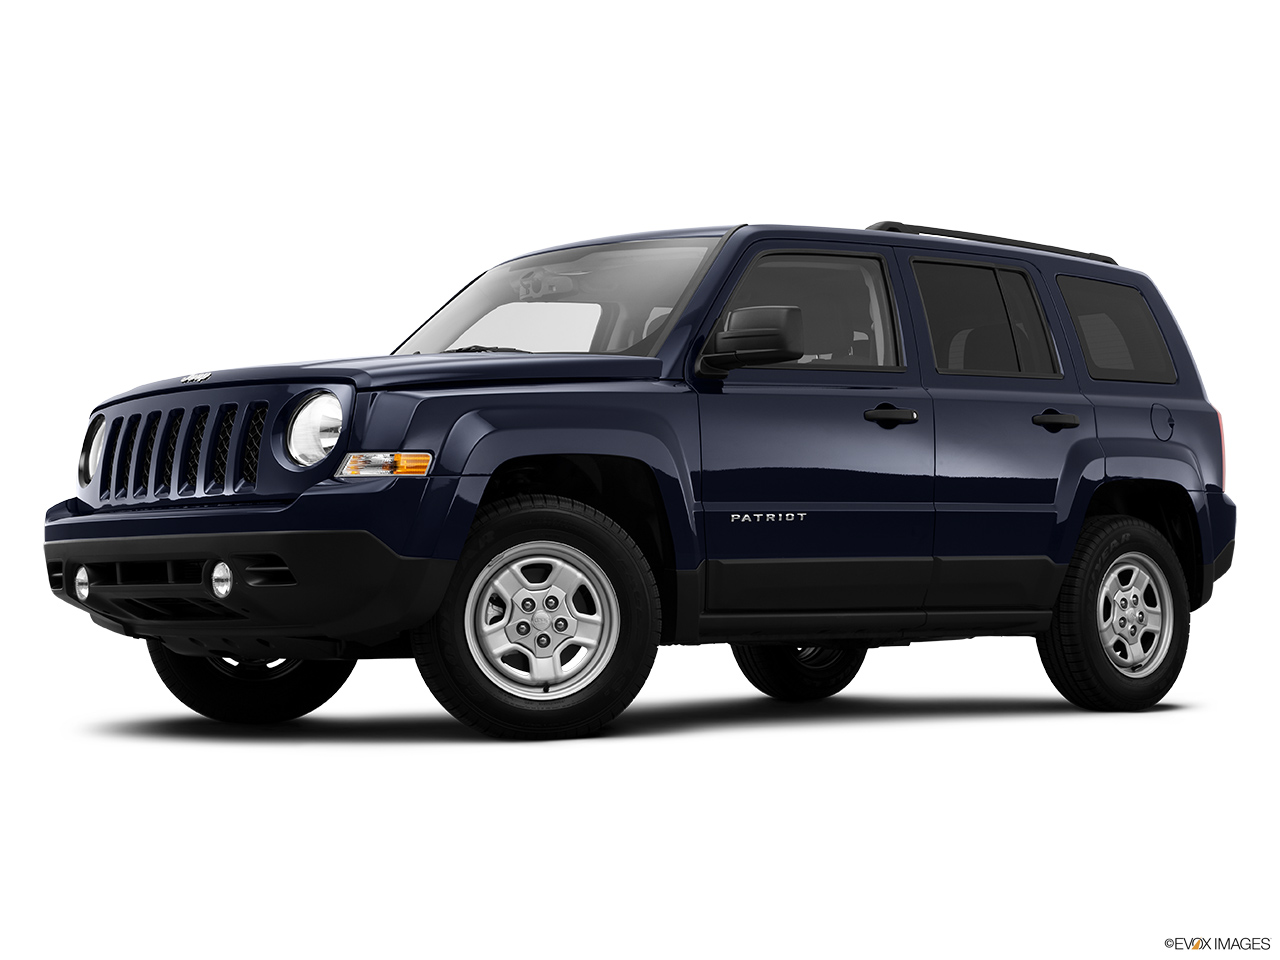 jeep patriot the compact suvs 2006 2014 off road html autos weblog. Black Bedroom Furniture Sets. Home Design Ideas